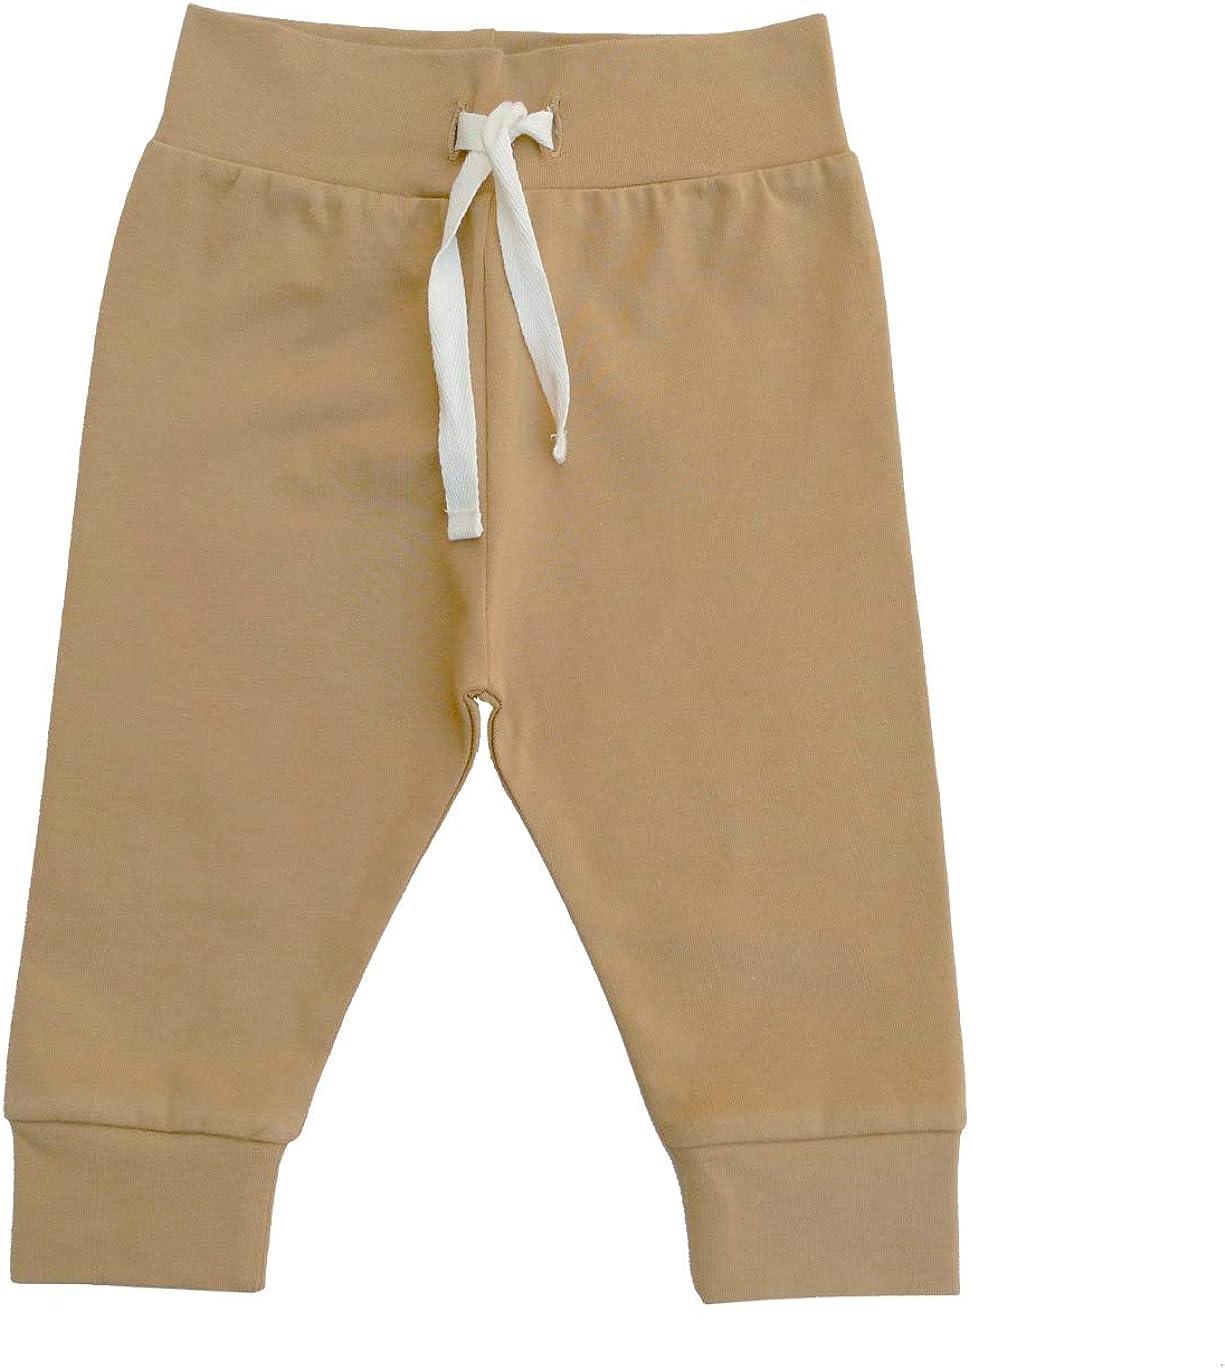 Lucy Lue Organics, Unisex Baby Organic Cotton Pants, Modern Baby Leggings (0-12m)